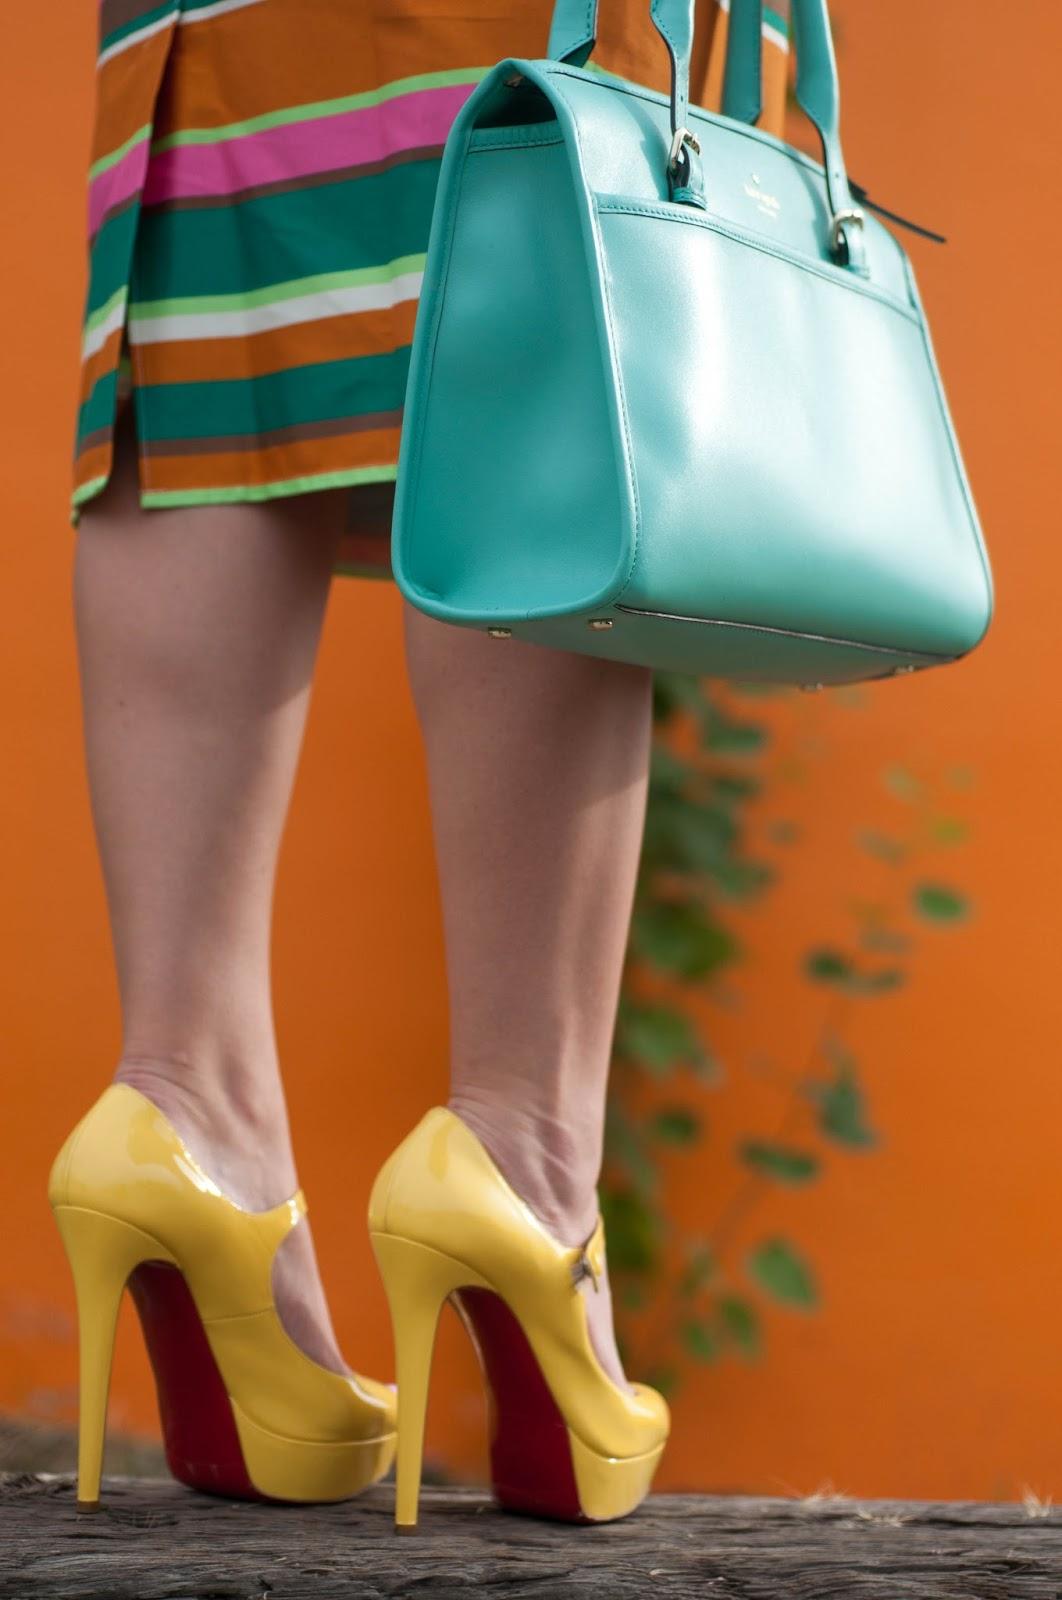 yellow heels, red soles, christian louboutin heels, kate spade handbag, asos skirt, striped skirt